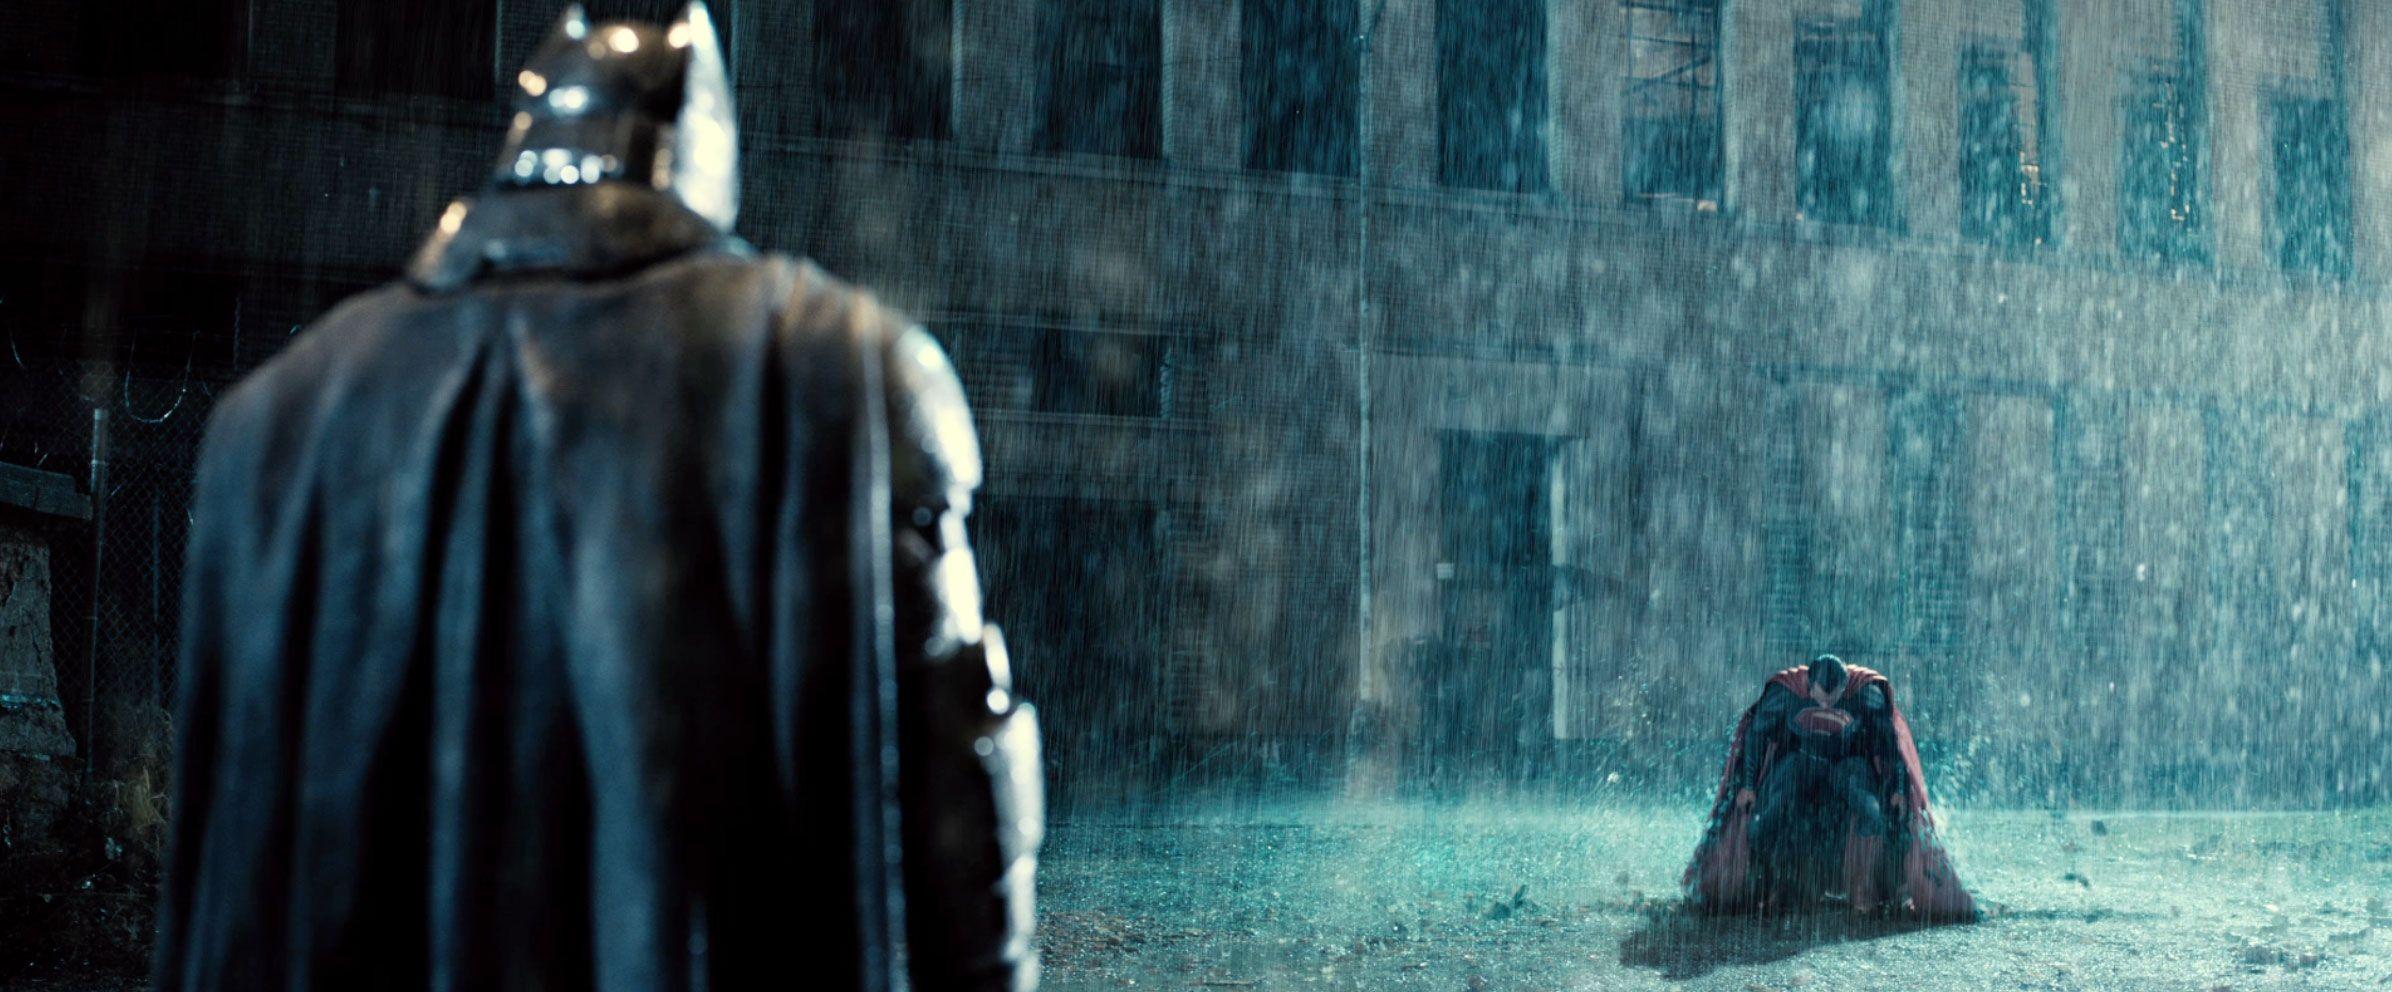 Batman V Superman Trailer Screengrab 34